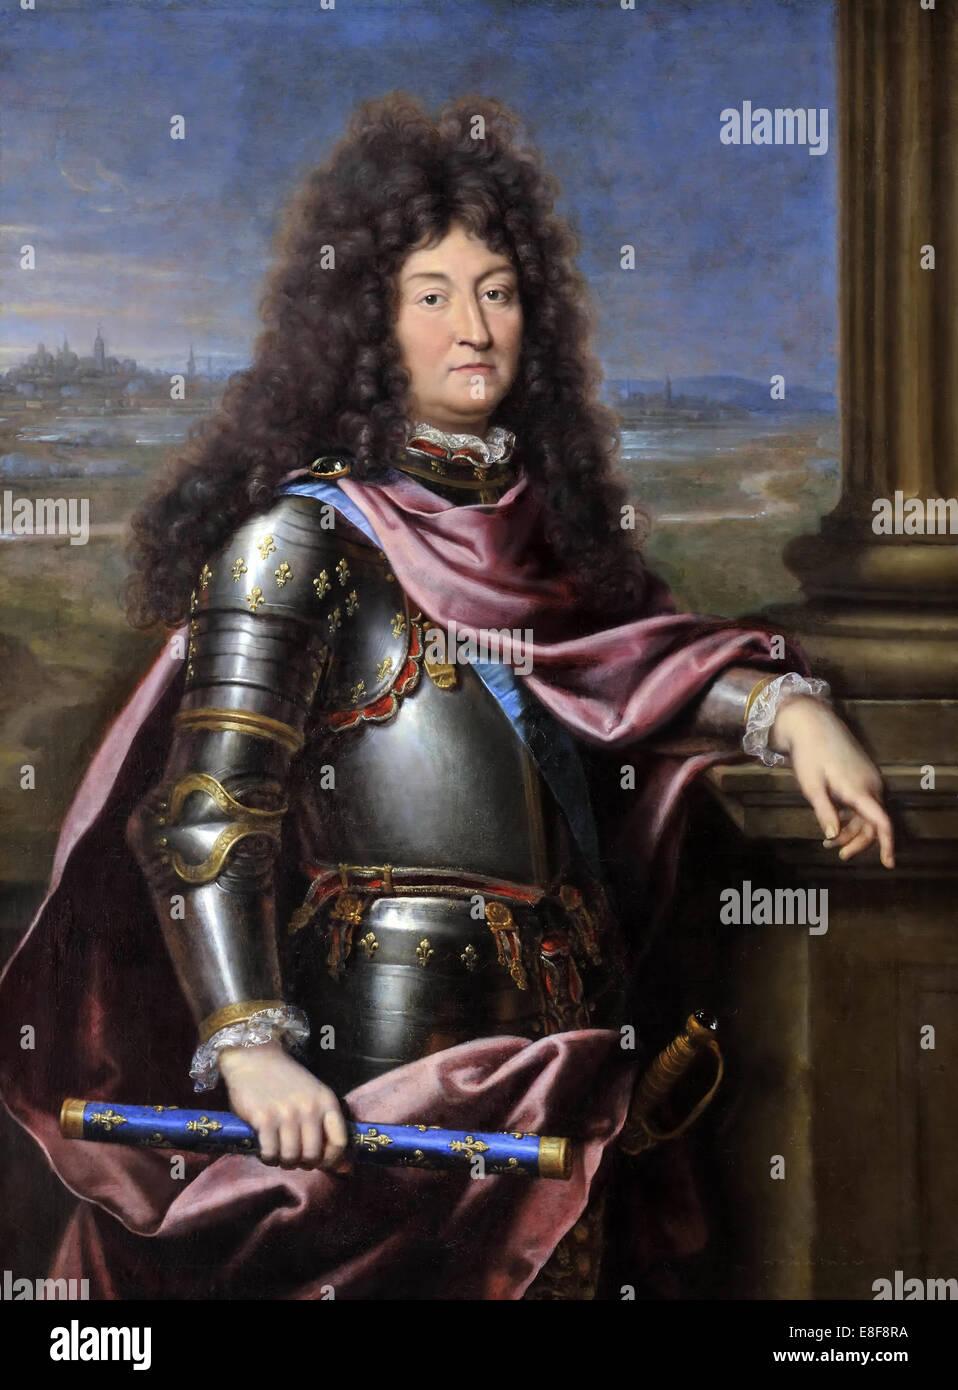 Louis XIV, King of France (1638-1715). Artist: Mignard, Pierre (1612-1695) - Stock Image